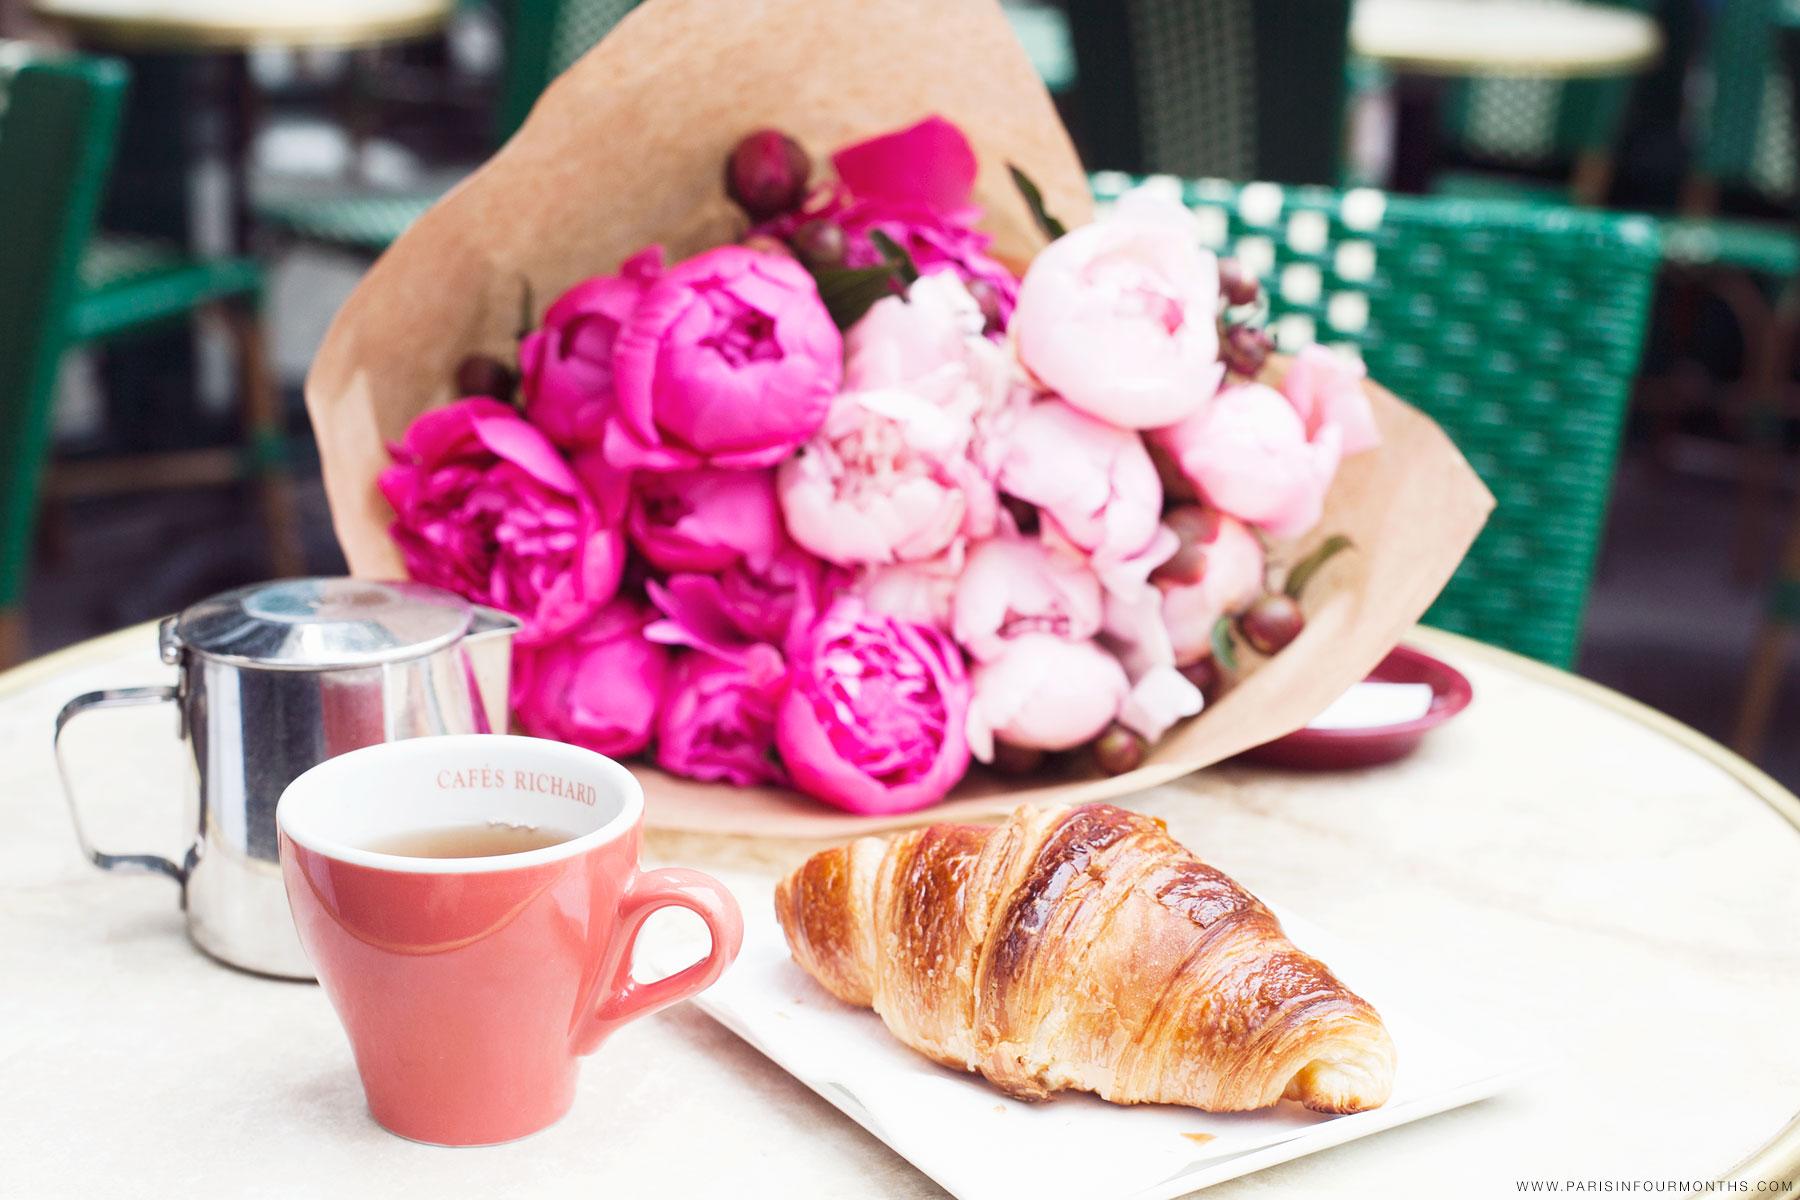 Parisian breakfast by Carin Olsson (Paris in Four Months)